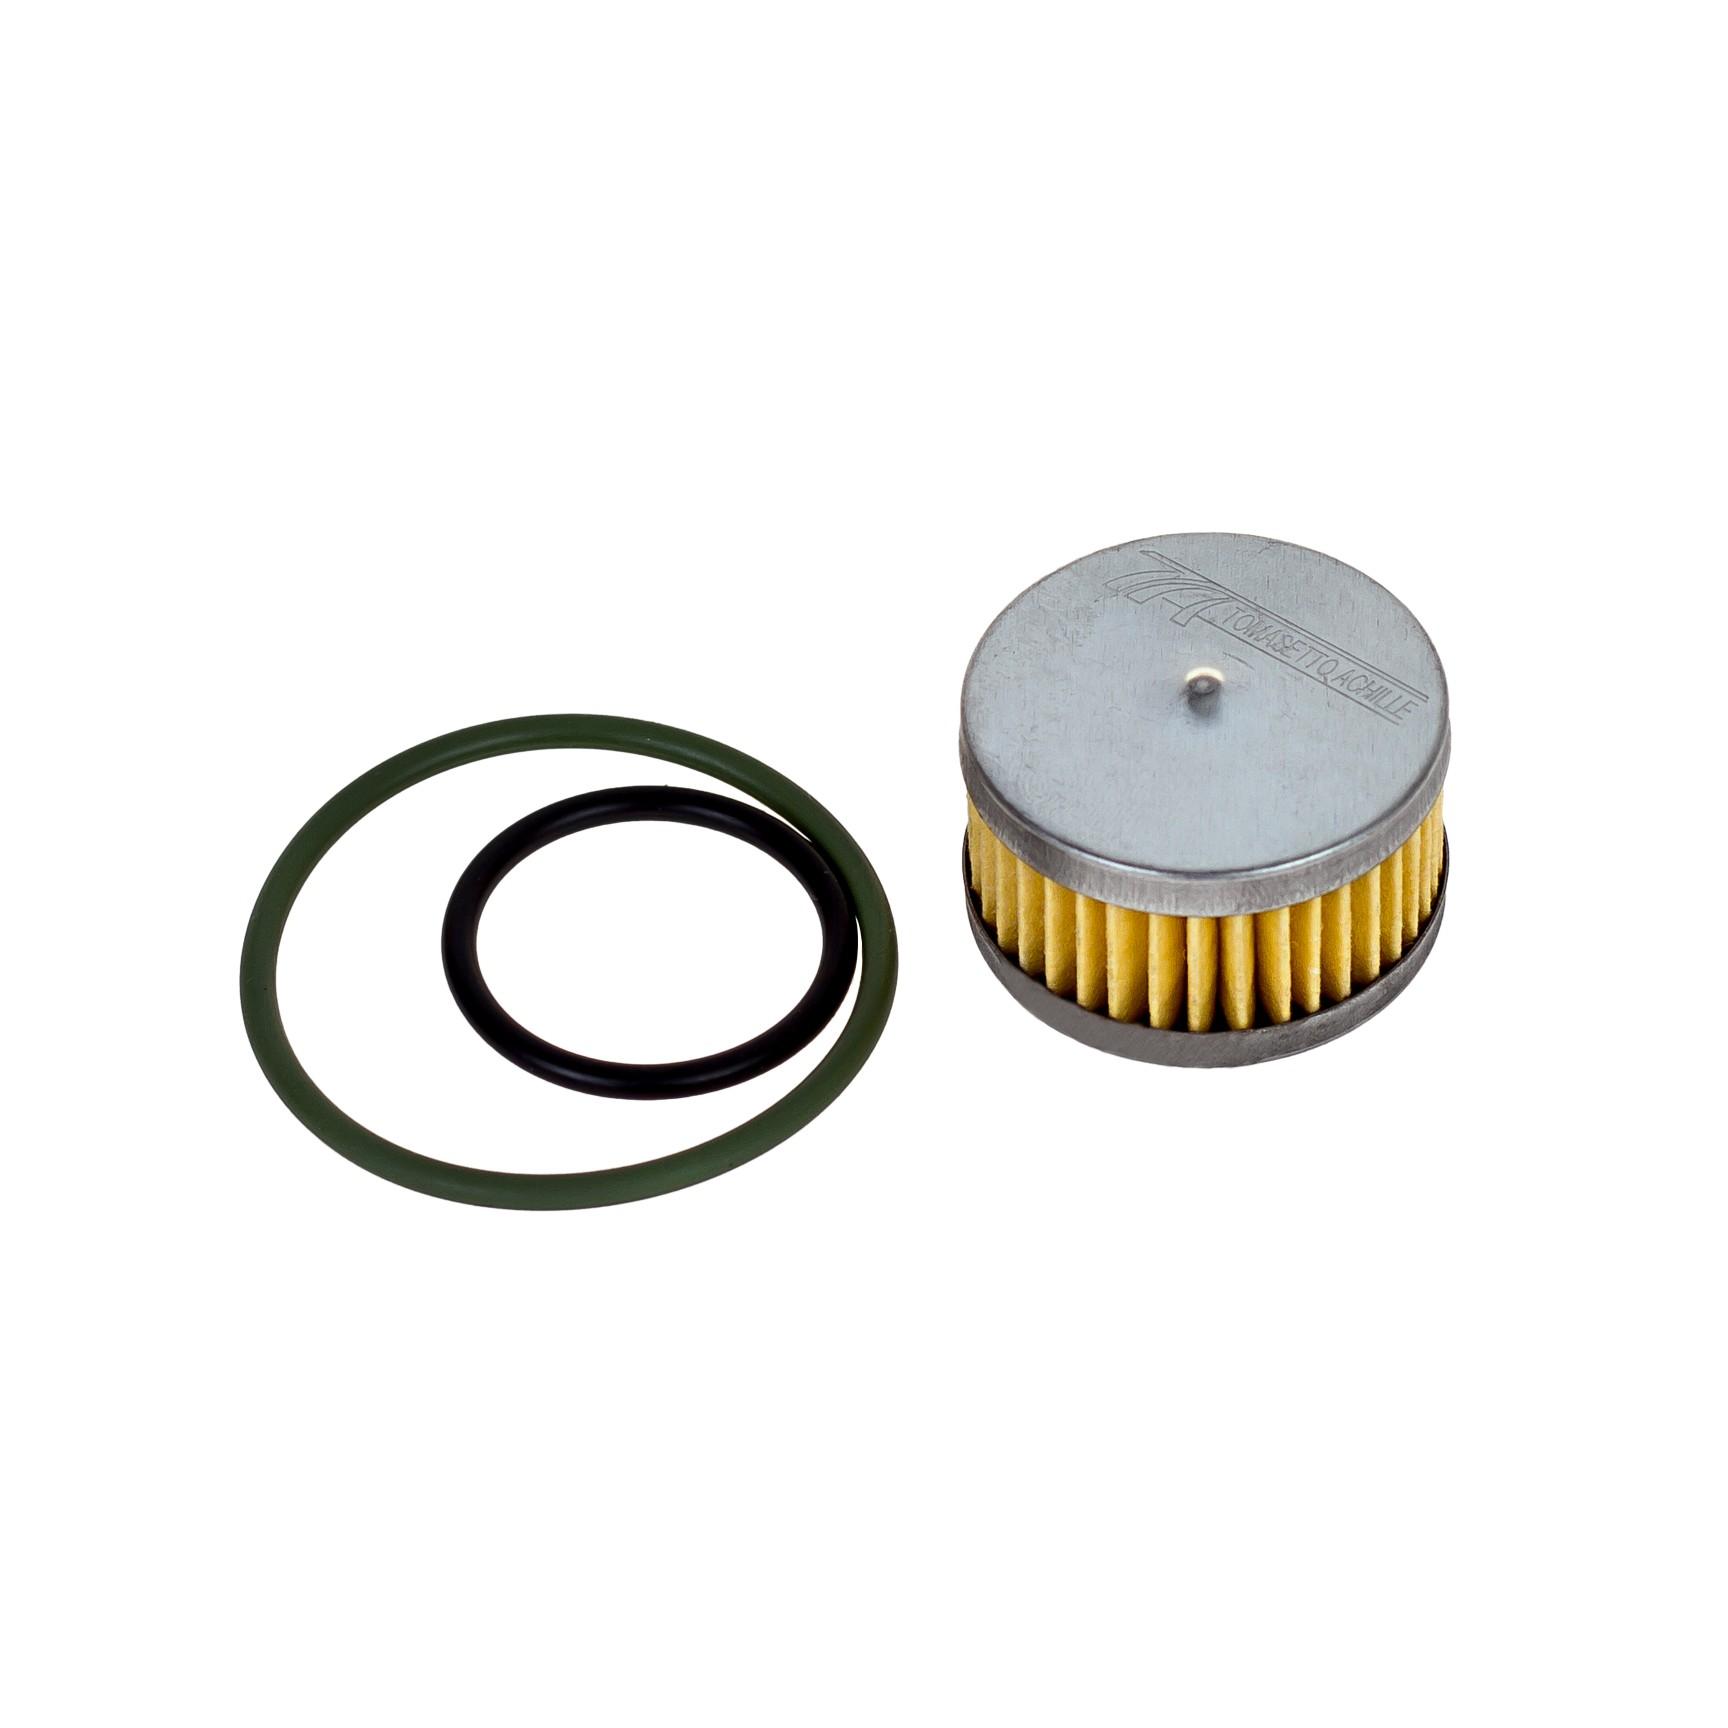 Accessories - Tomasetto LPG reducer repair kit RGAT 2070